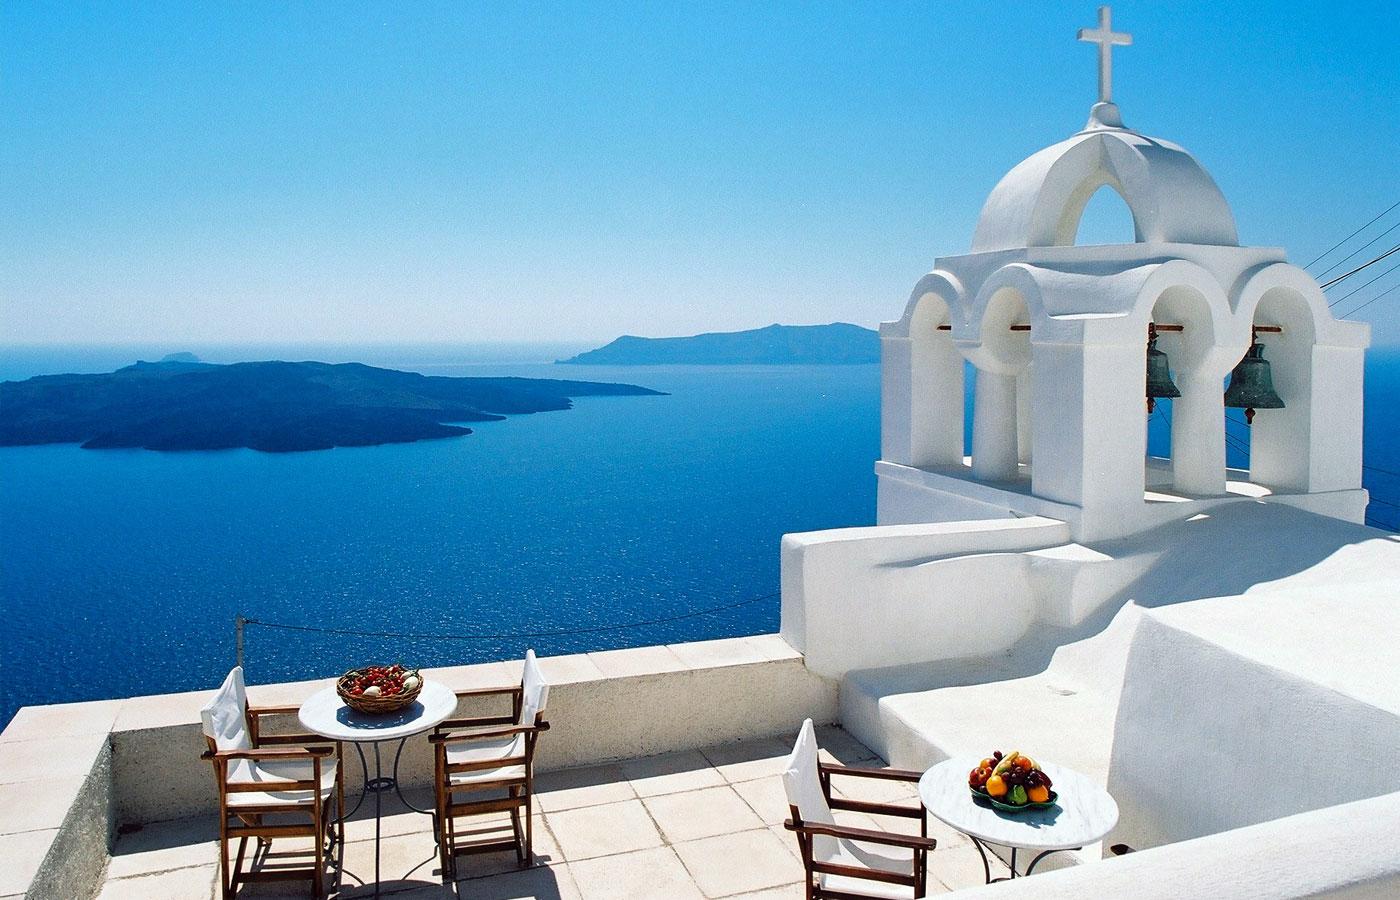 santorini-greece-photo-3 - Copy